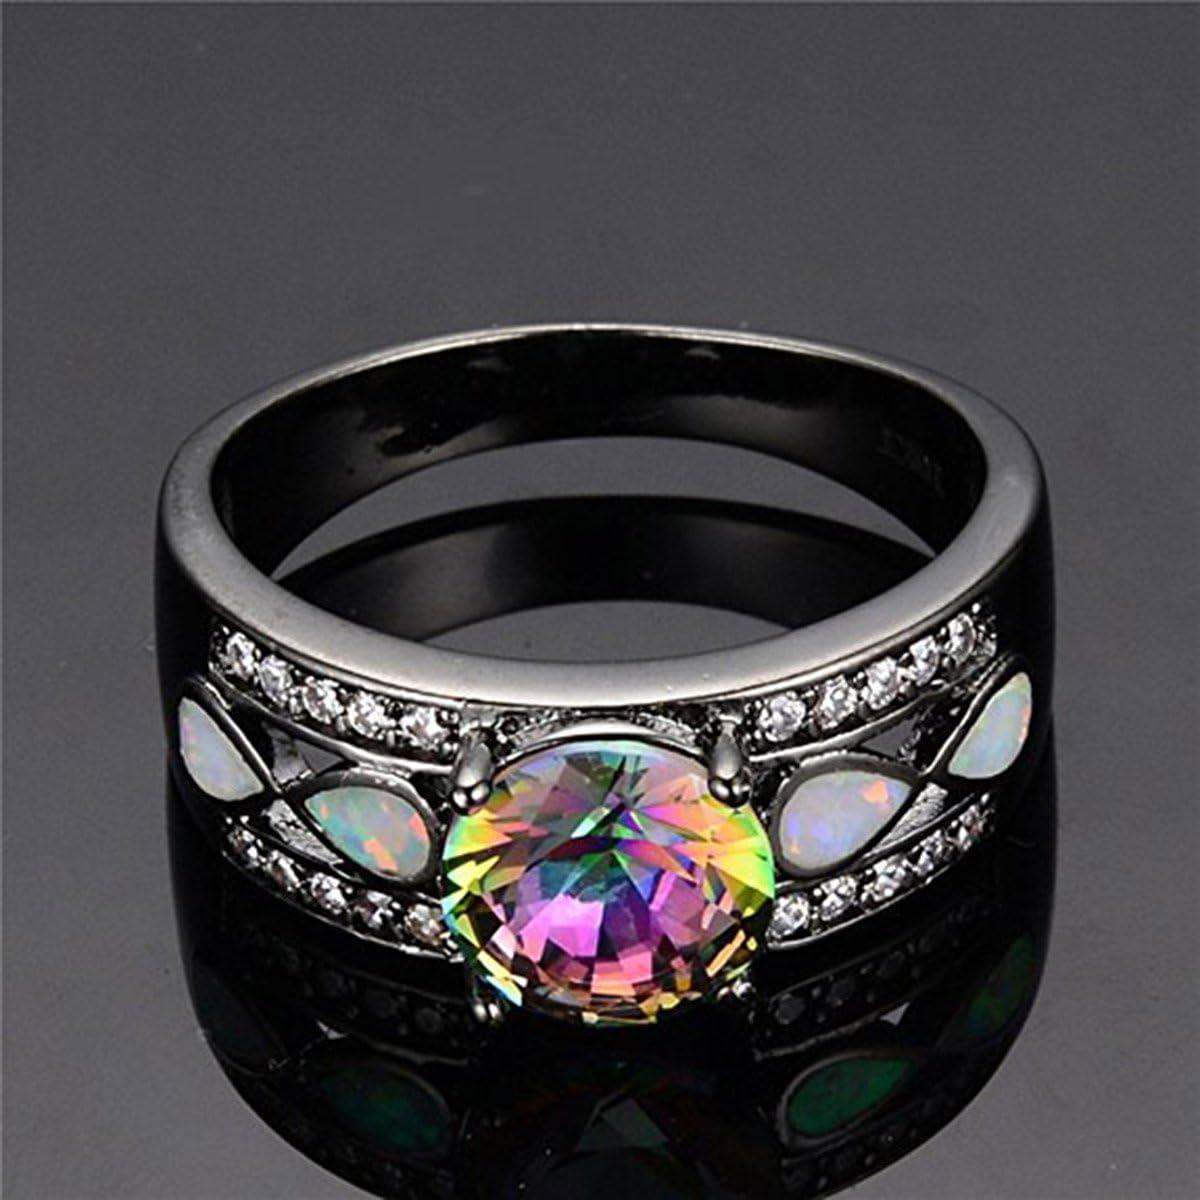 Kissmilk Colorful Opal Rings Rainbow Mysteric Crystal Ladies Black Gold Size 6-10